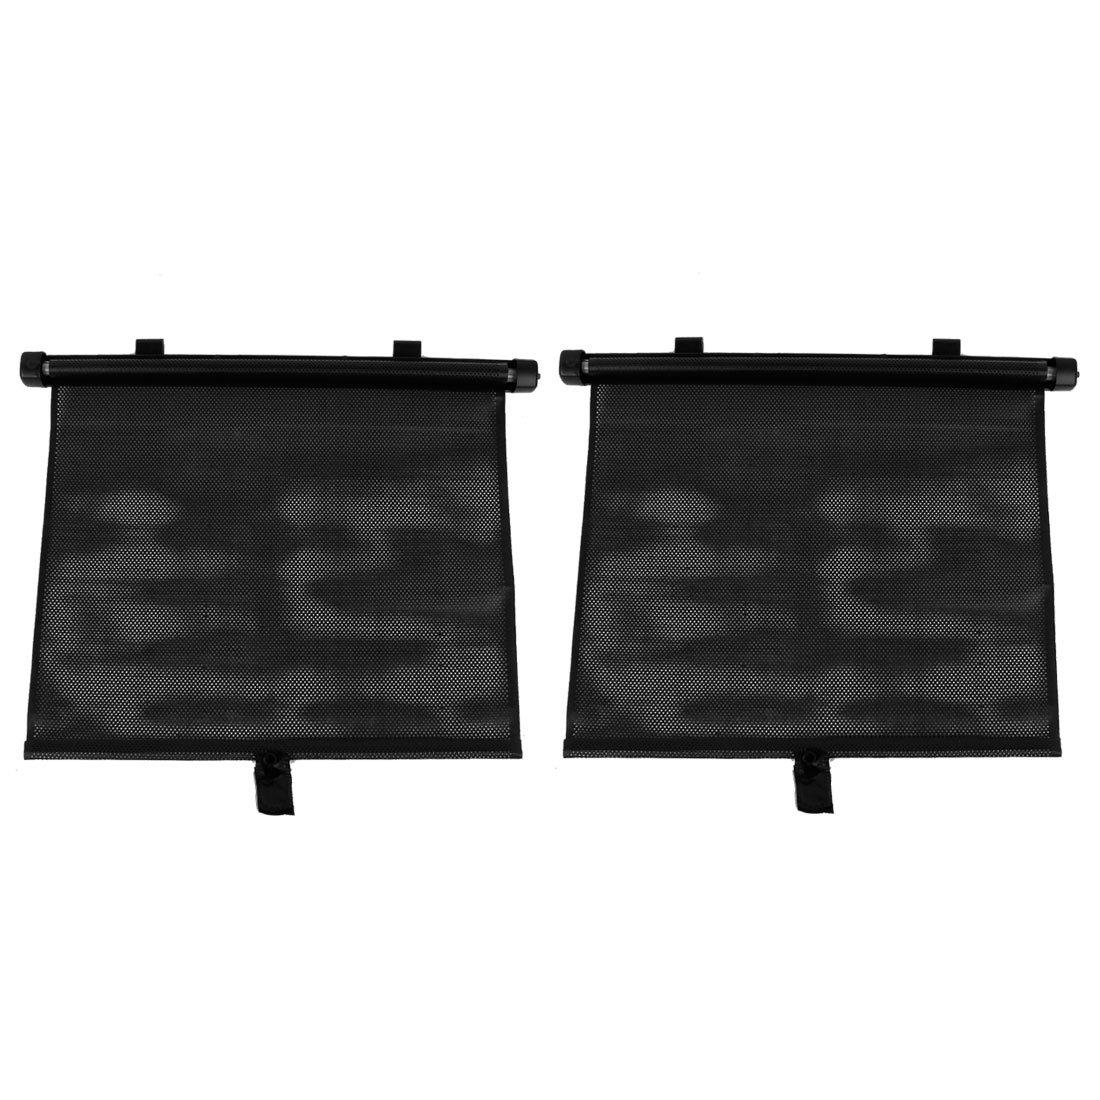 sourcing map Sourcingmap® 2 Uds Parabrisas Negro Sol Sombrilla Visera Quitasol para Ventanilla Trasera Coche Auto 48cm x 36cm a14032000ux0125